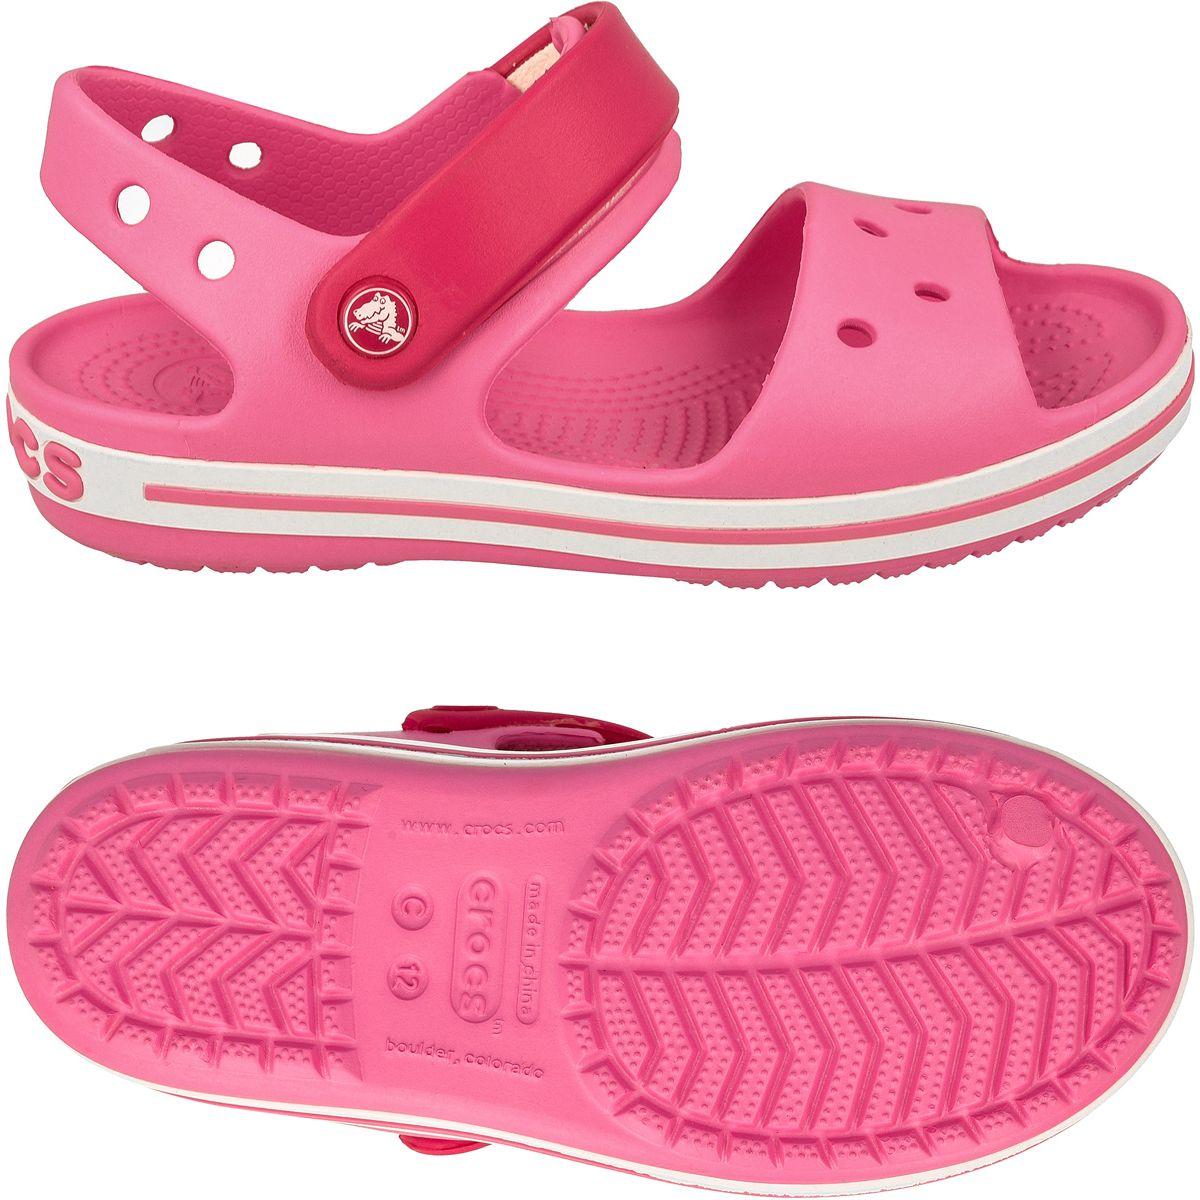 ebf4c8eae02ce Sandały Crocs Crocband Jr 12856 różowe 23-24 - 7005996116 ...